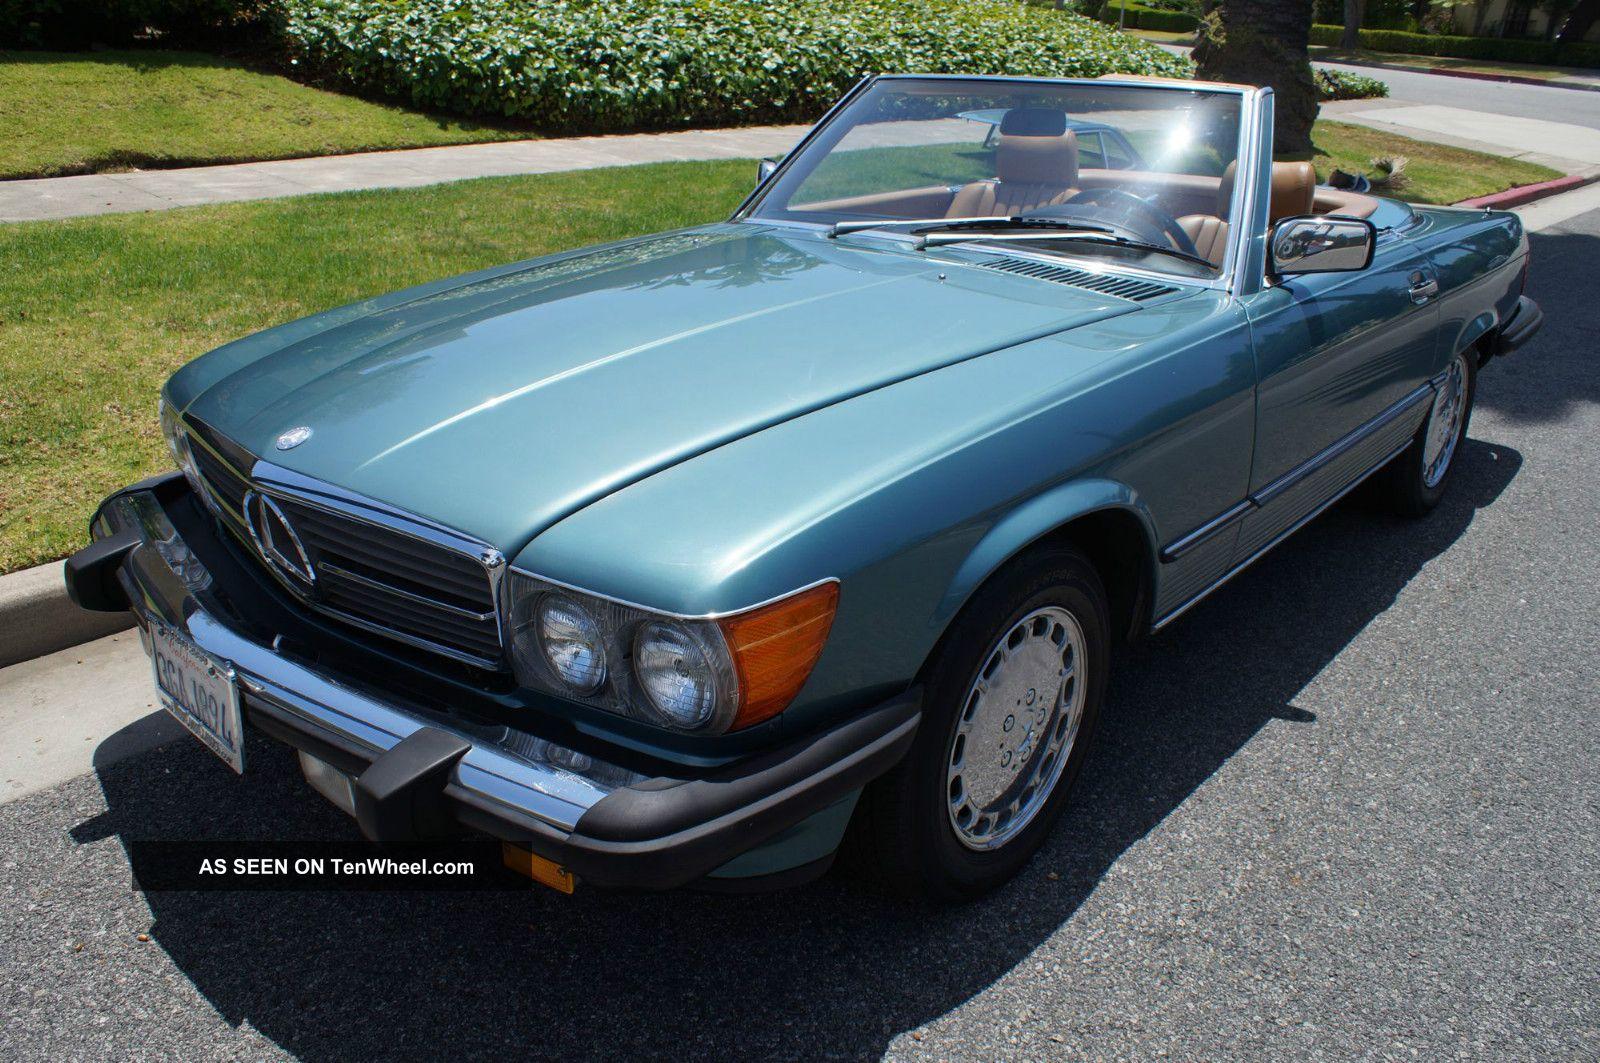 1988 560sl California Car In Rare ' Petrol Blue Green Poly ' Color SL-Class photo